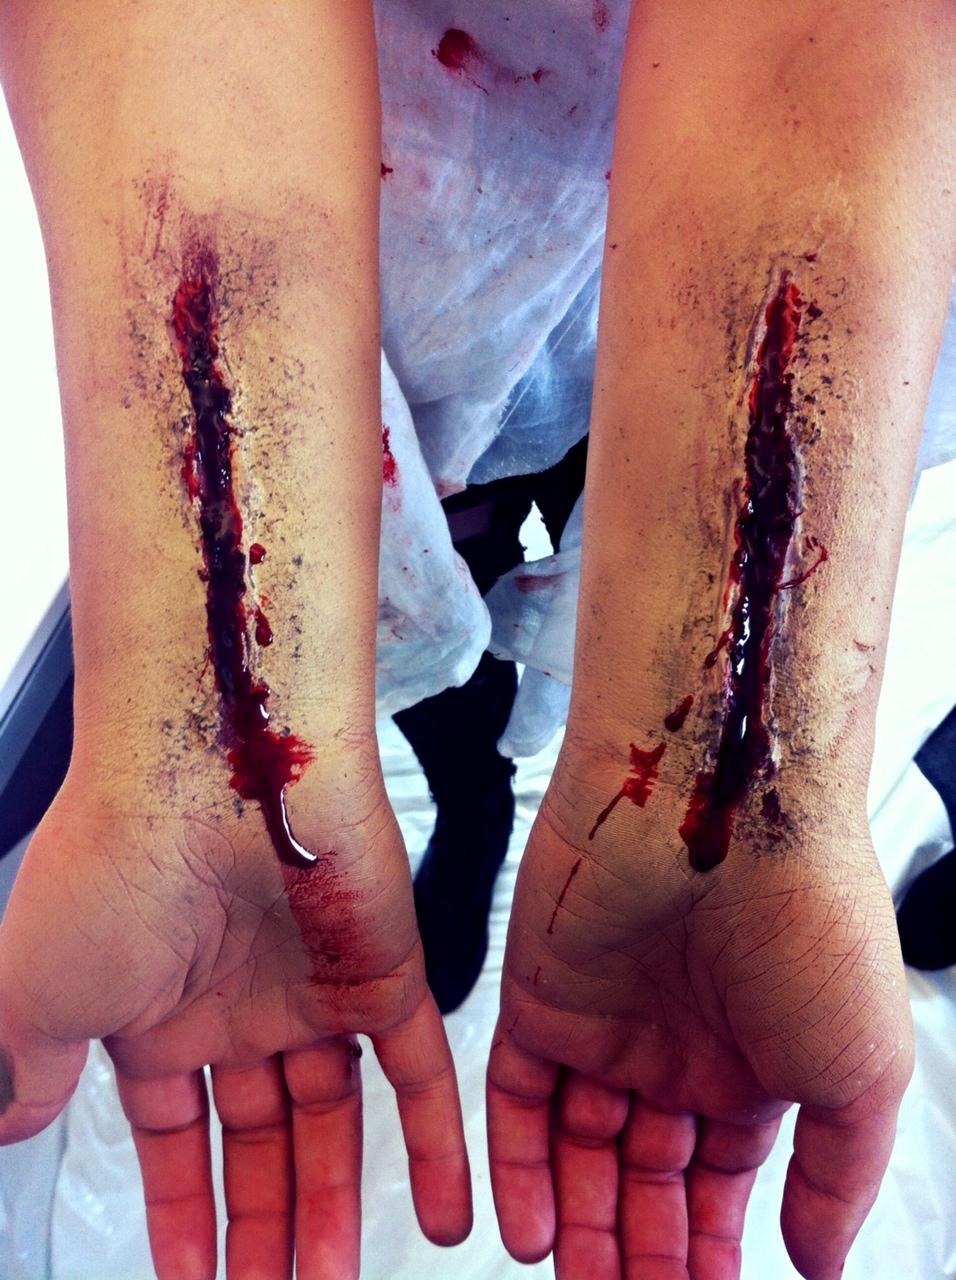 SPX slit wrists